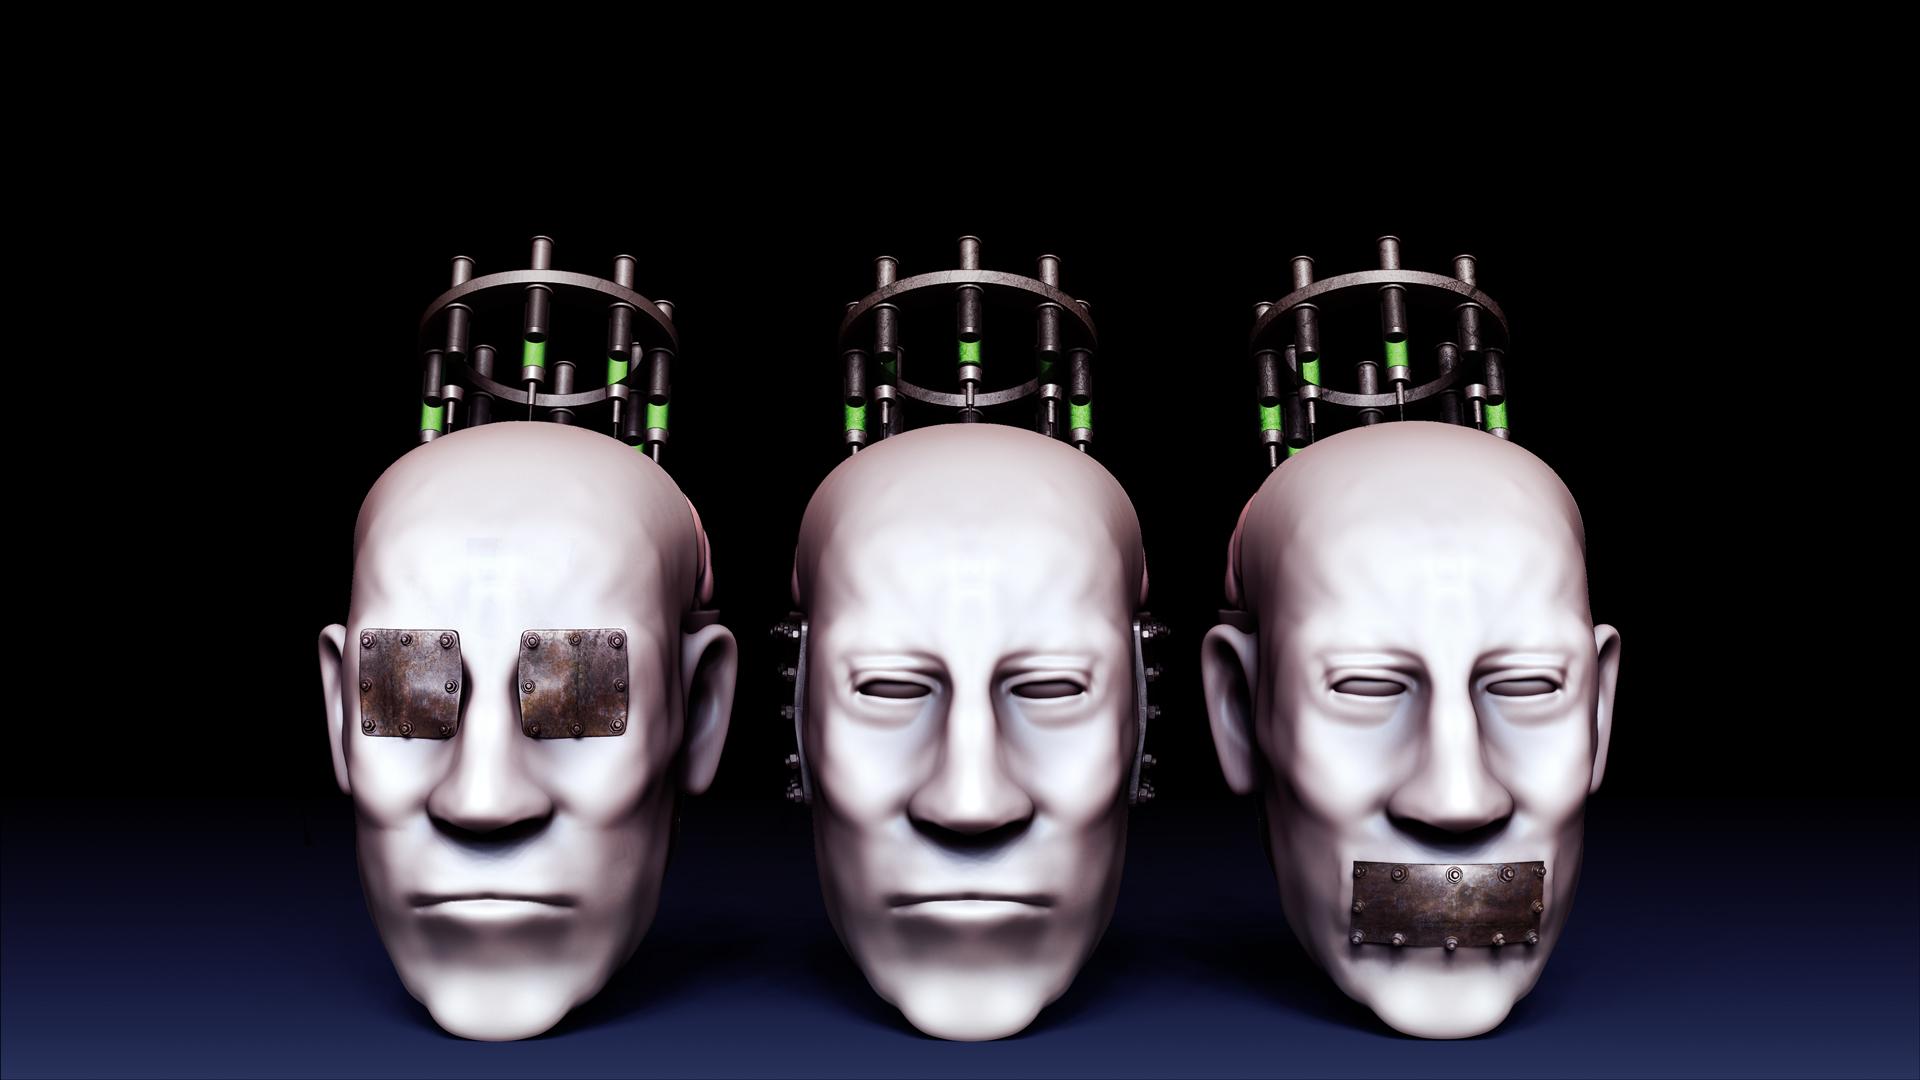 See no evil, Hear no evil, Speak no evil by Simulacrumble on DeviantArt